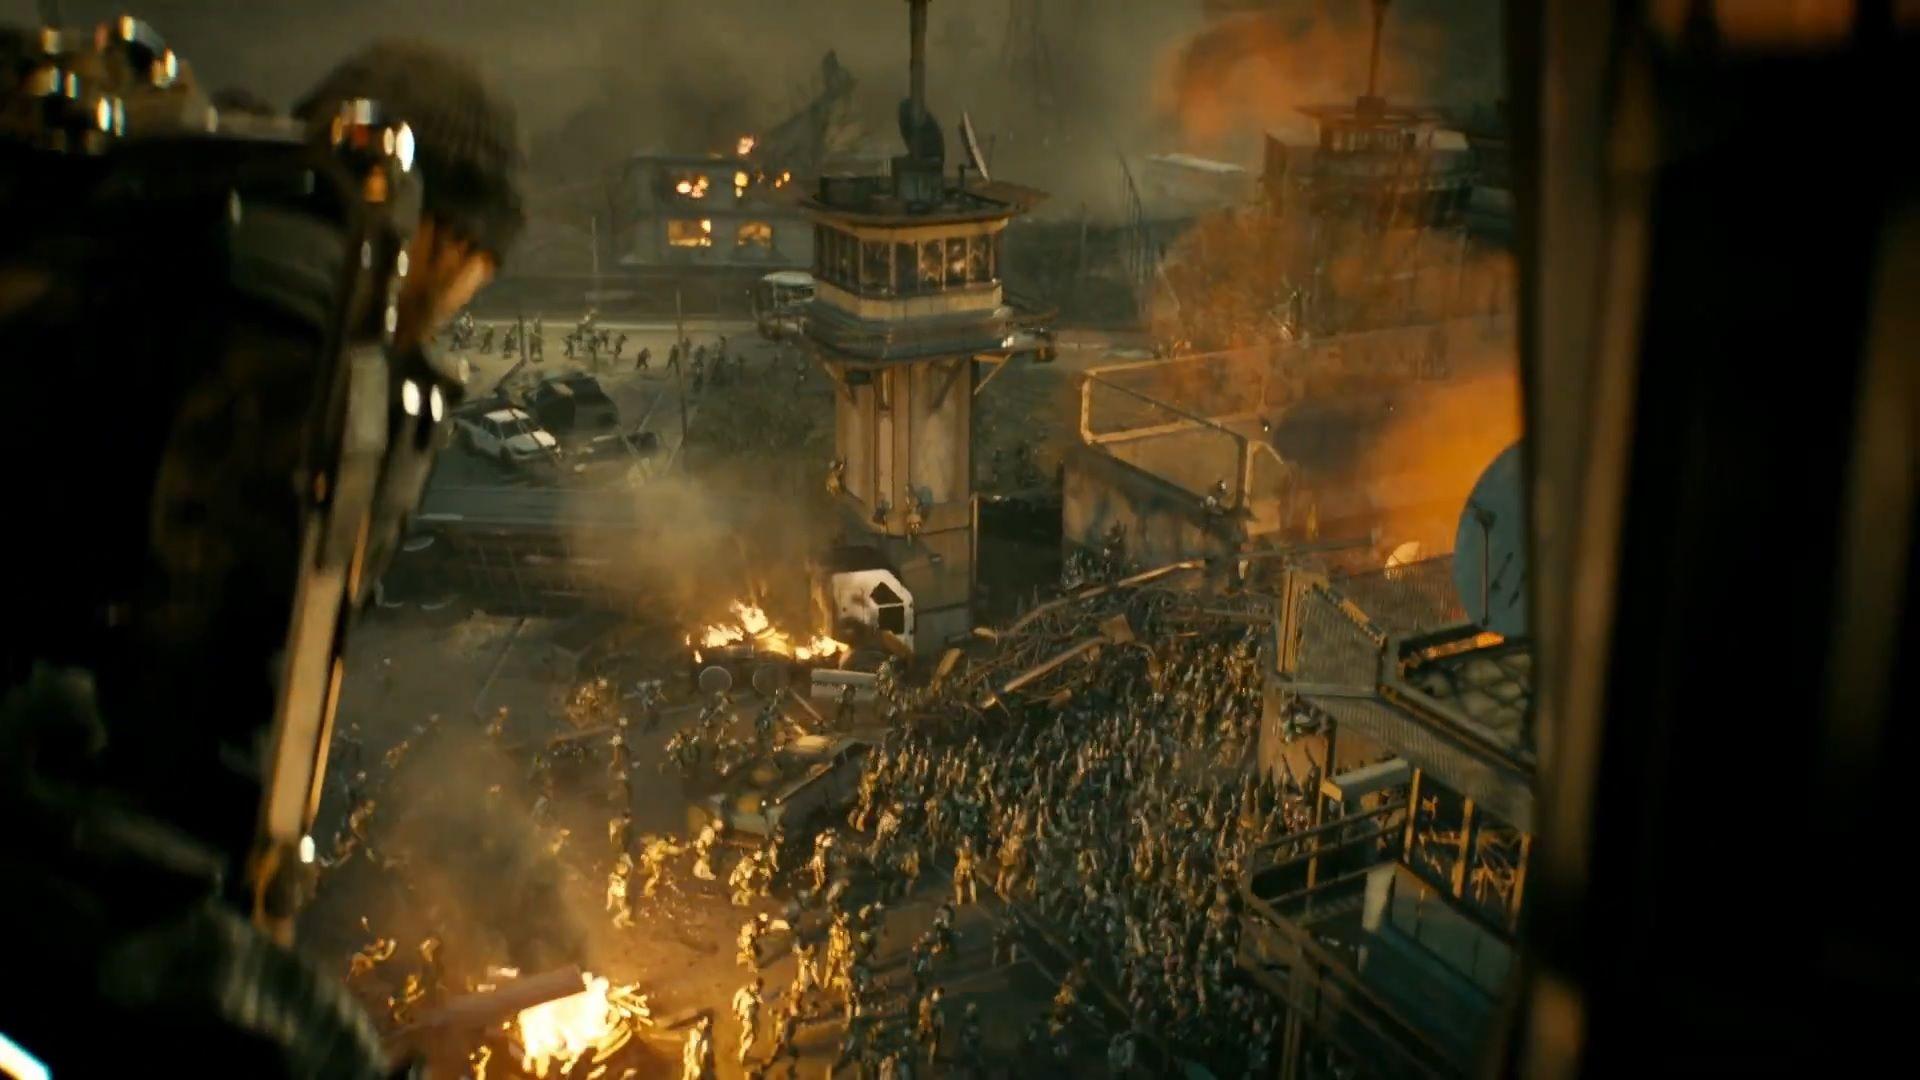 Call Of Duty Advanced Warfare Exo Zombies Trailer Articles - Call duty exo zombies trailer looks epic